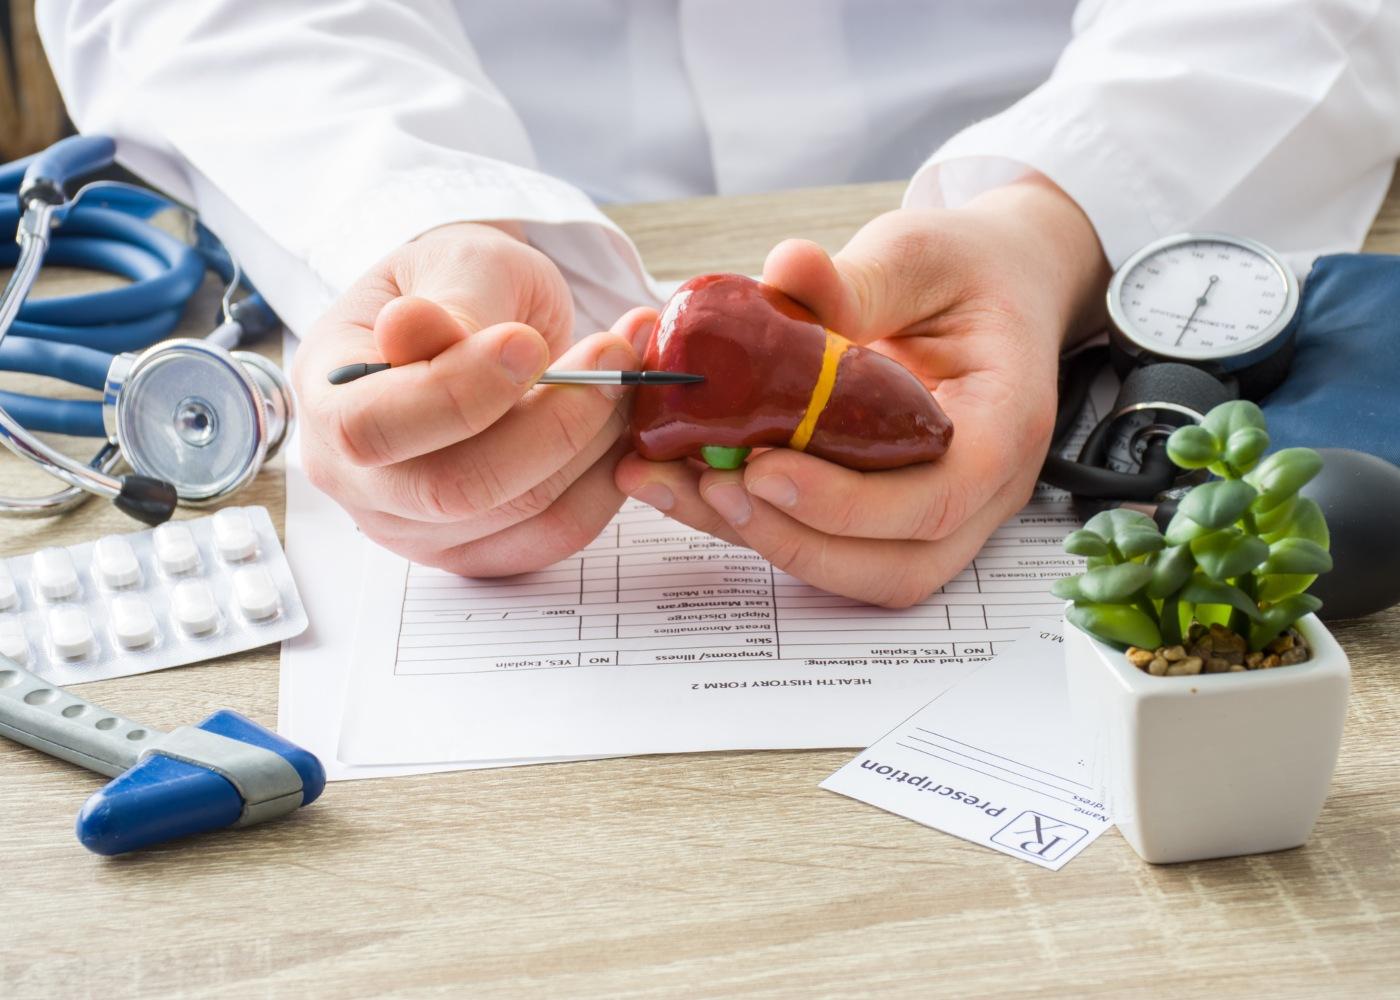 Médico a analisar fígado